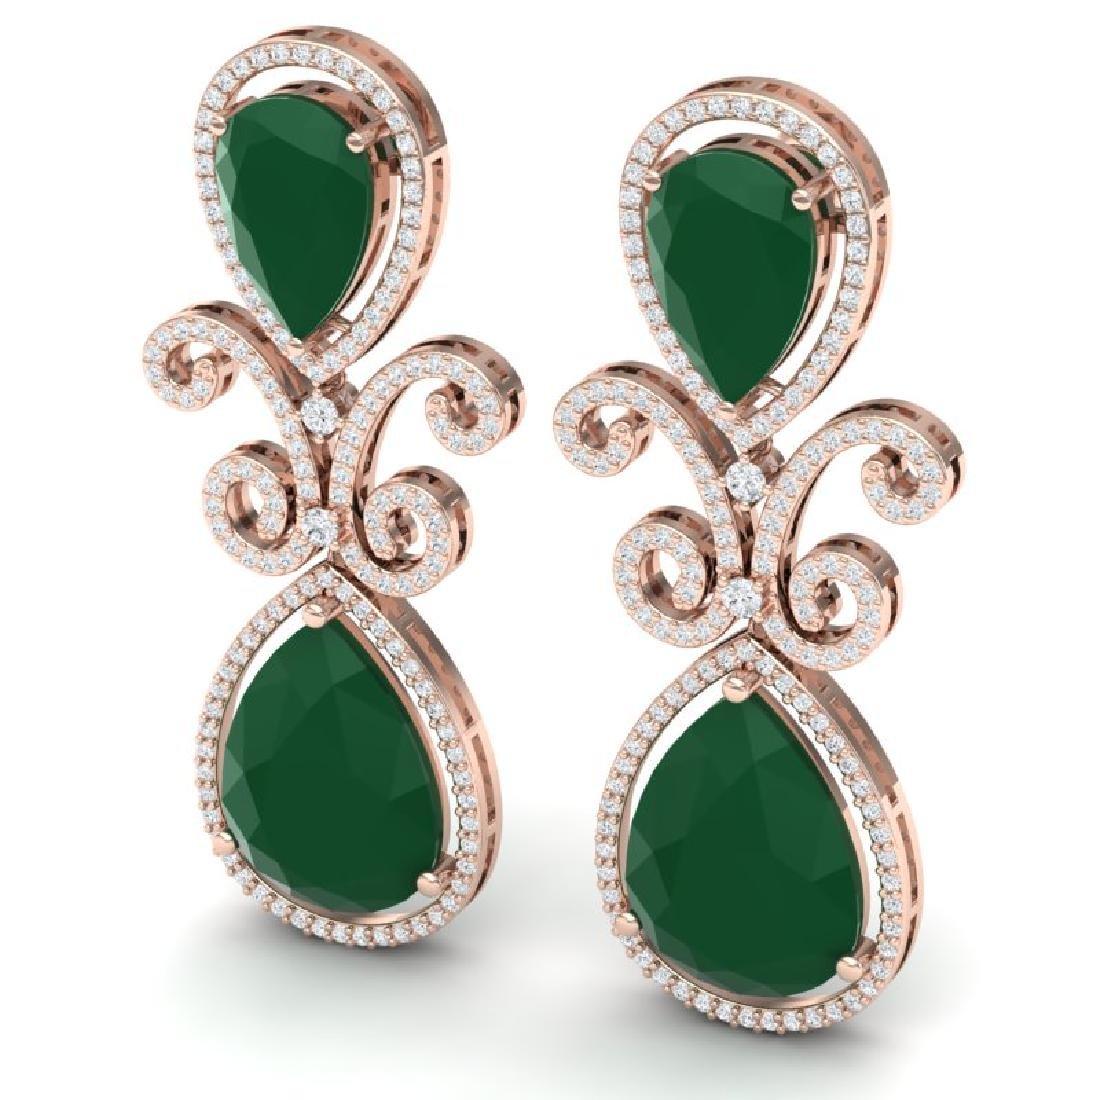 31.6 CTW Royalty Emerald & VS Diamond Earrings 18K Rose - 2